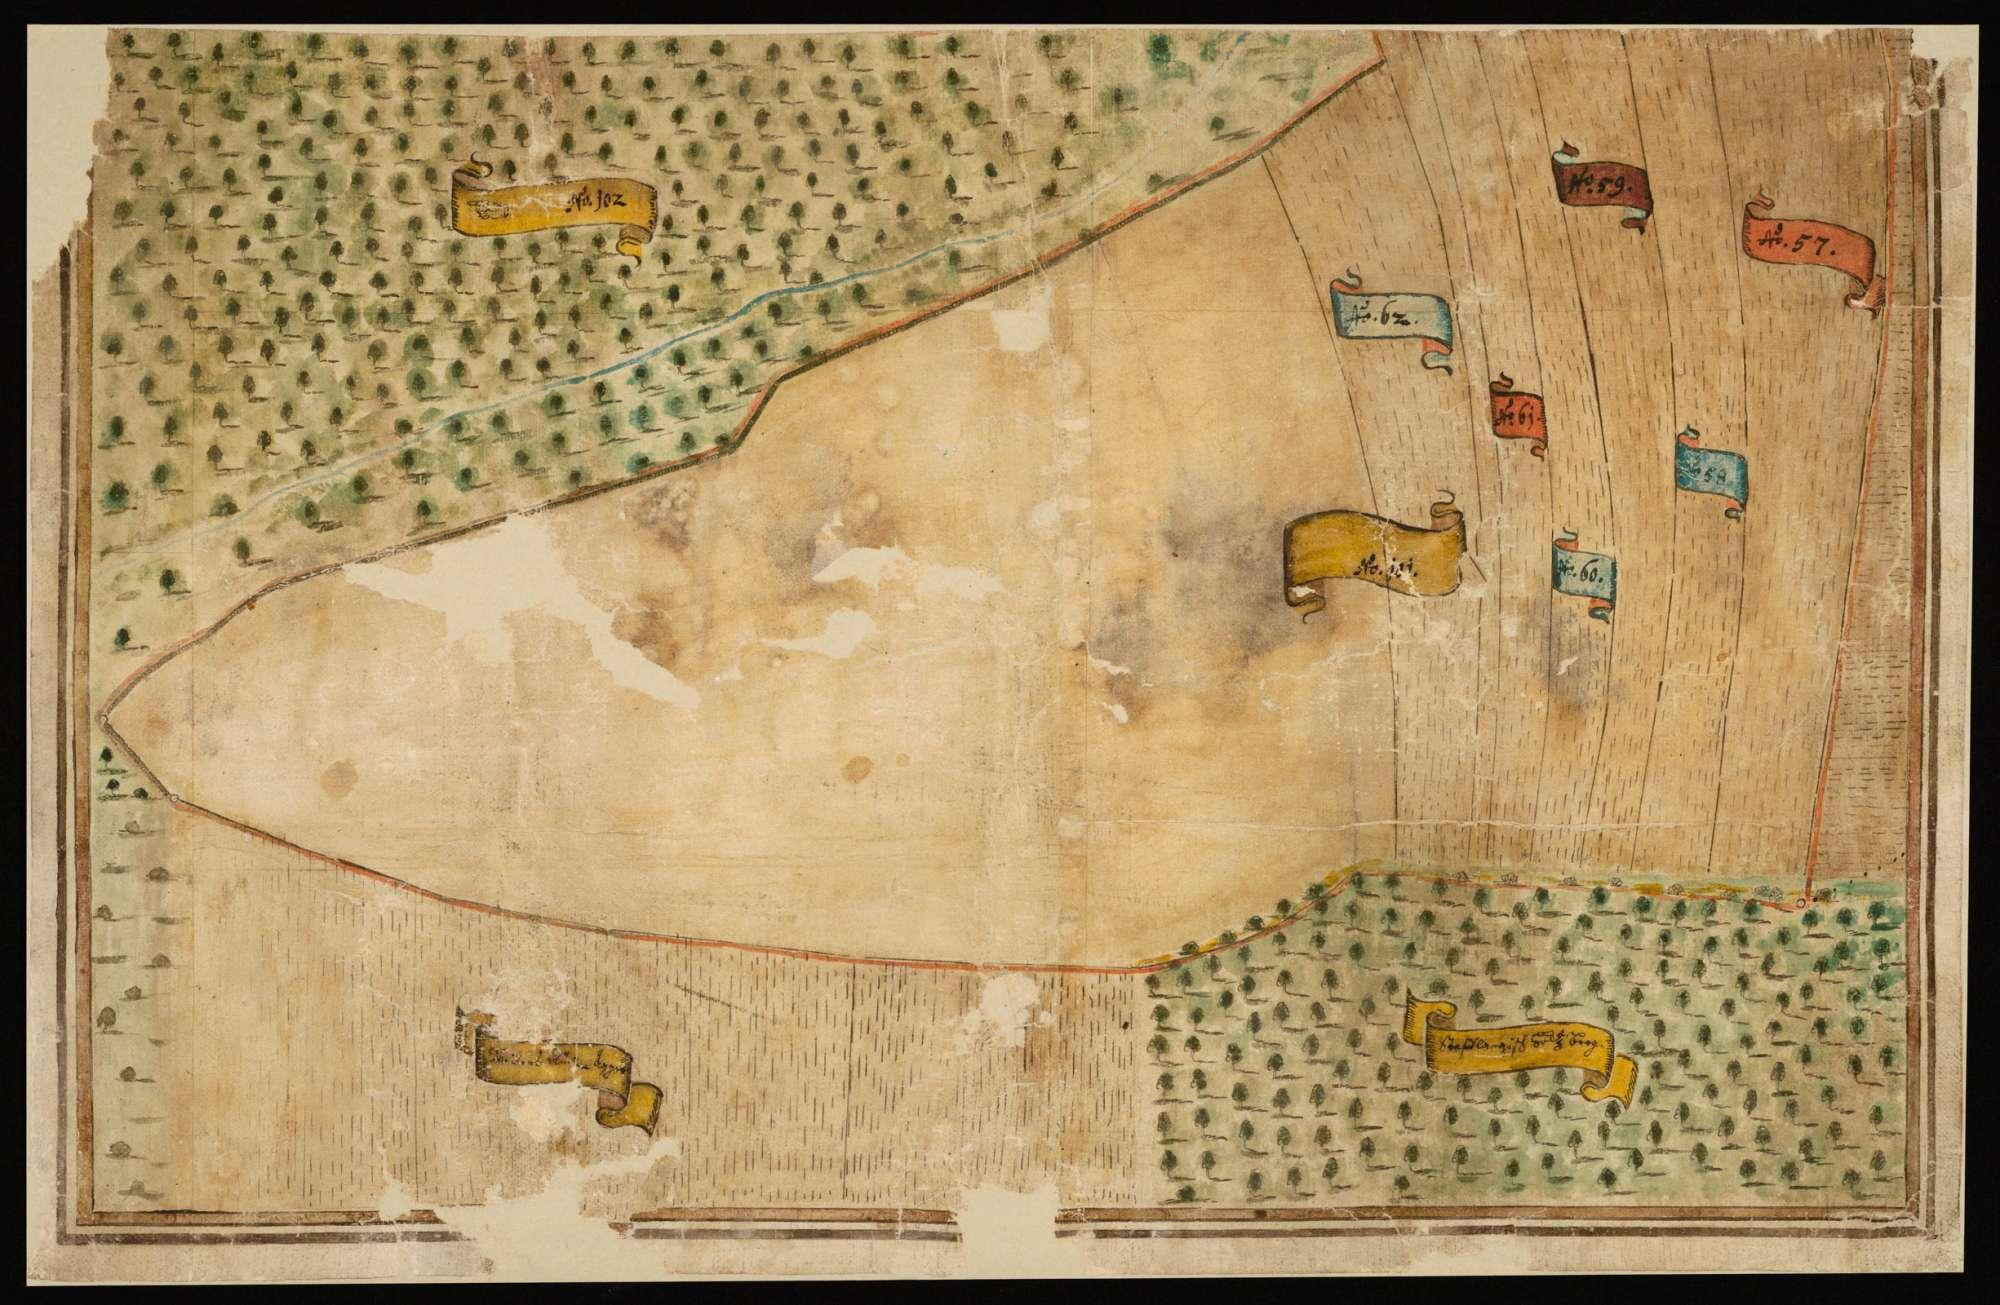 Stafflangen [Flurstücke in Hofen, Gem. Stafflangen] [Fragment], Bild 2